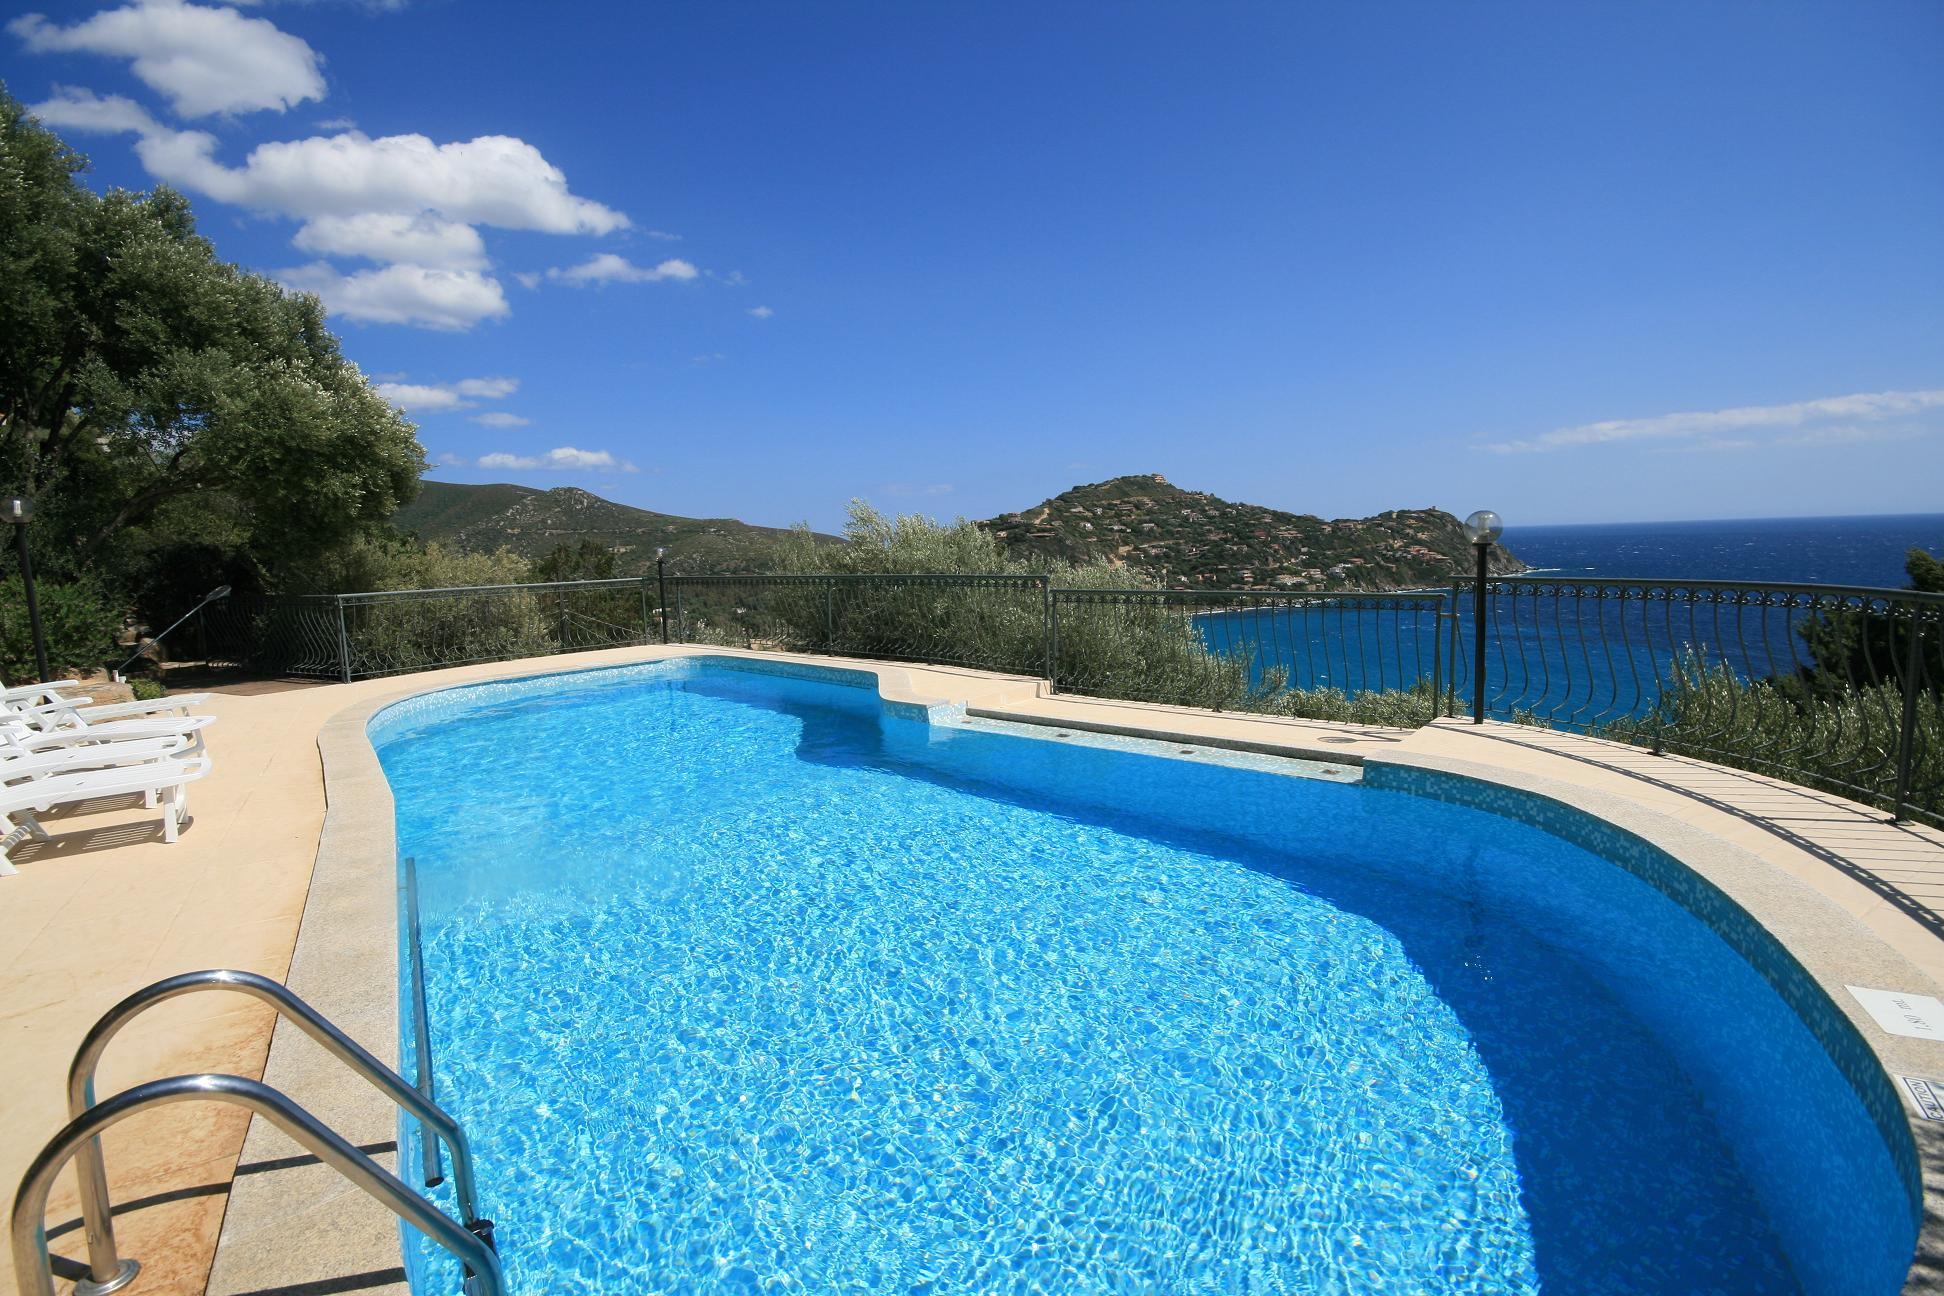 ITALY (Torre delle Stelle - Sardinia) - Fantastic villa ...